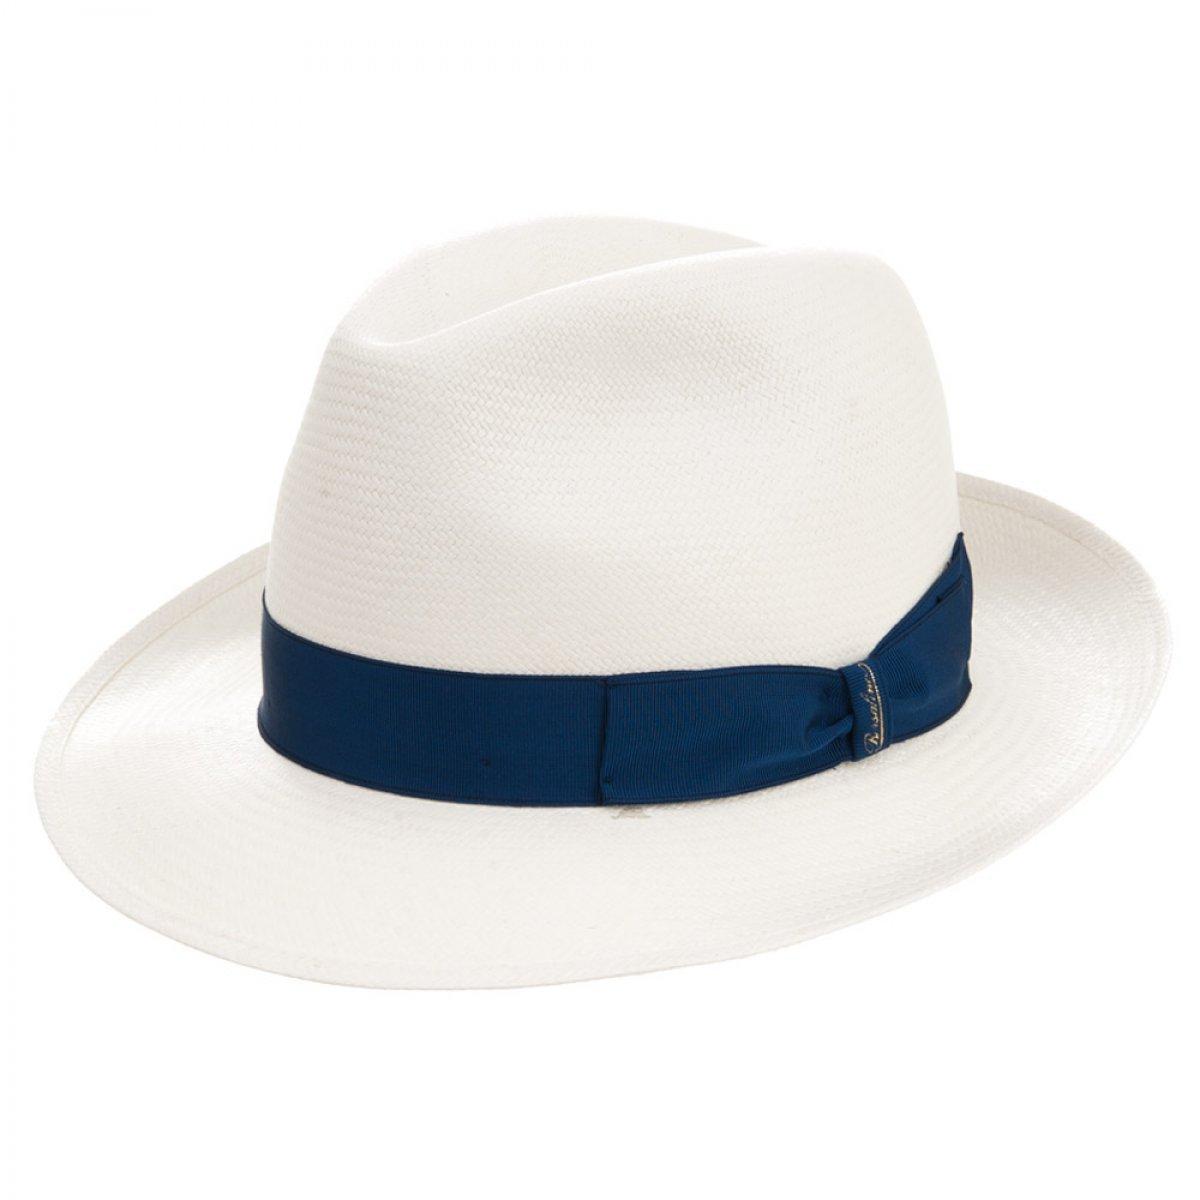 2ef521f413cd84 Panama straw hat signed Borsalino ...